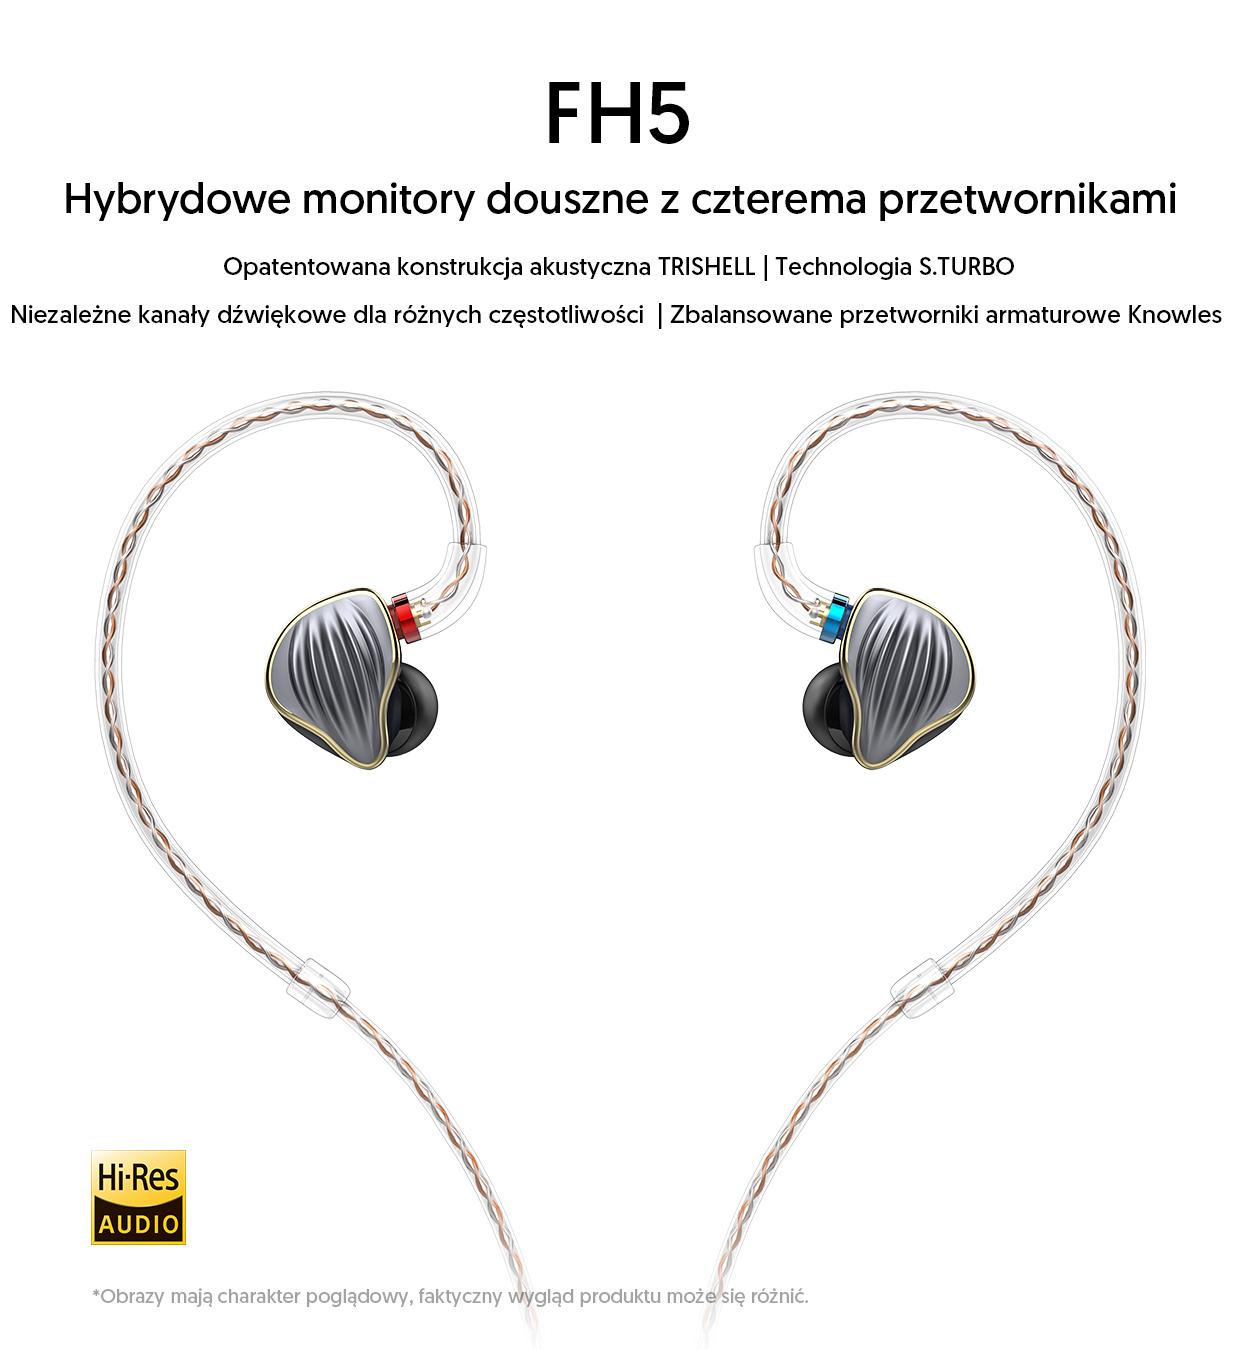 fiio fh5